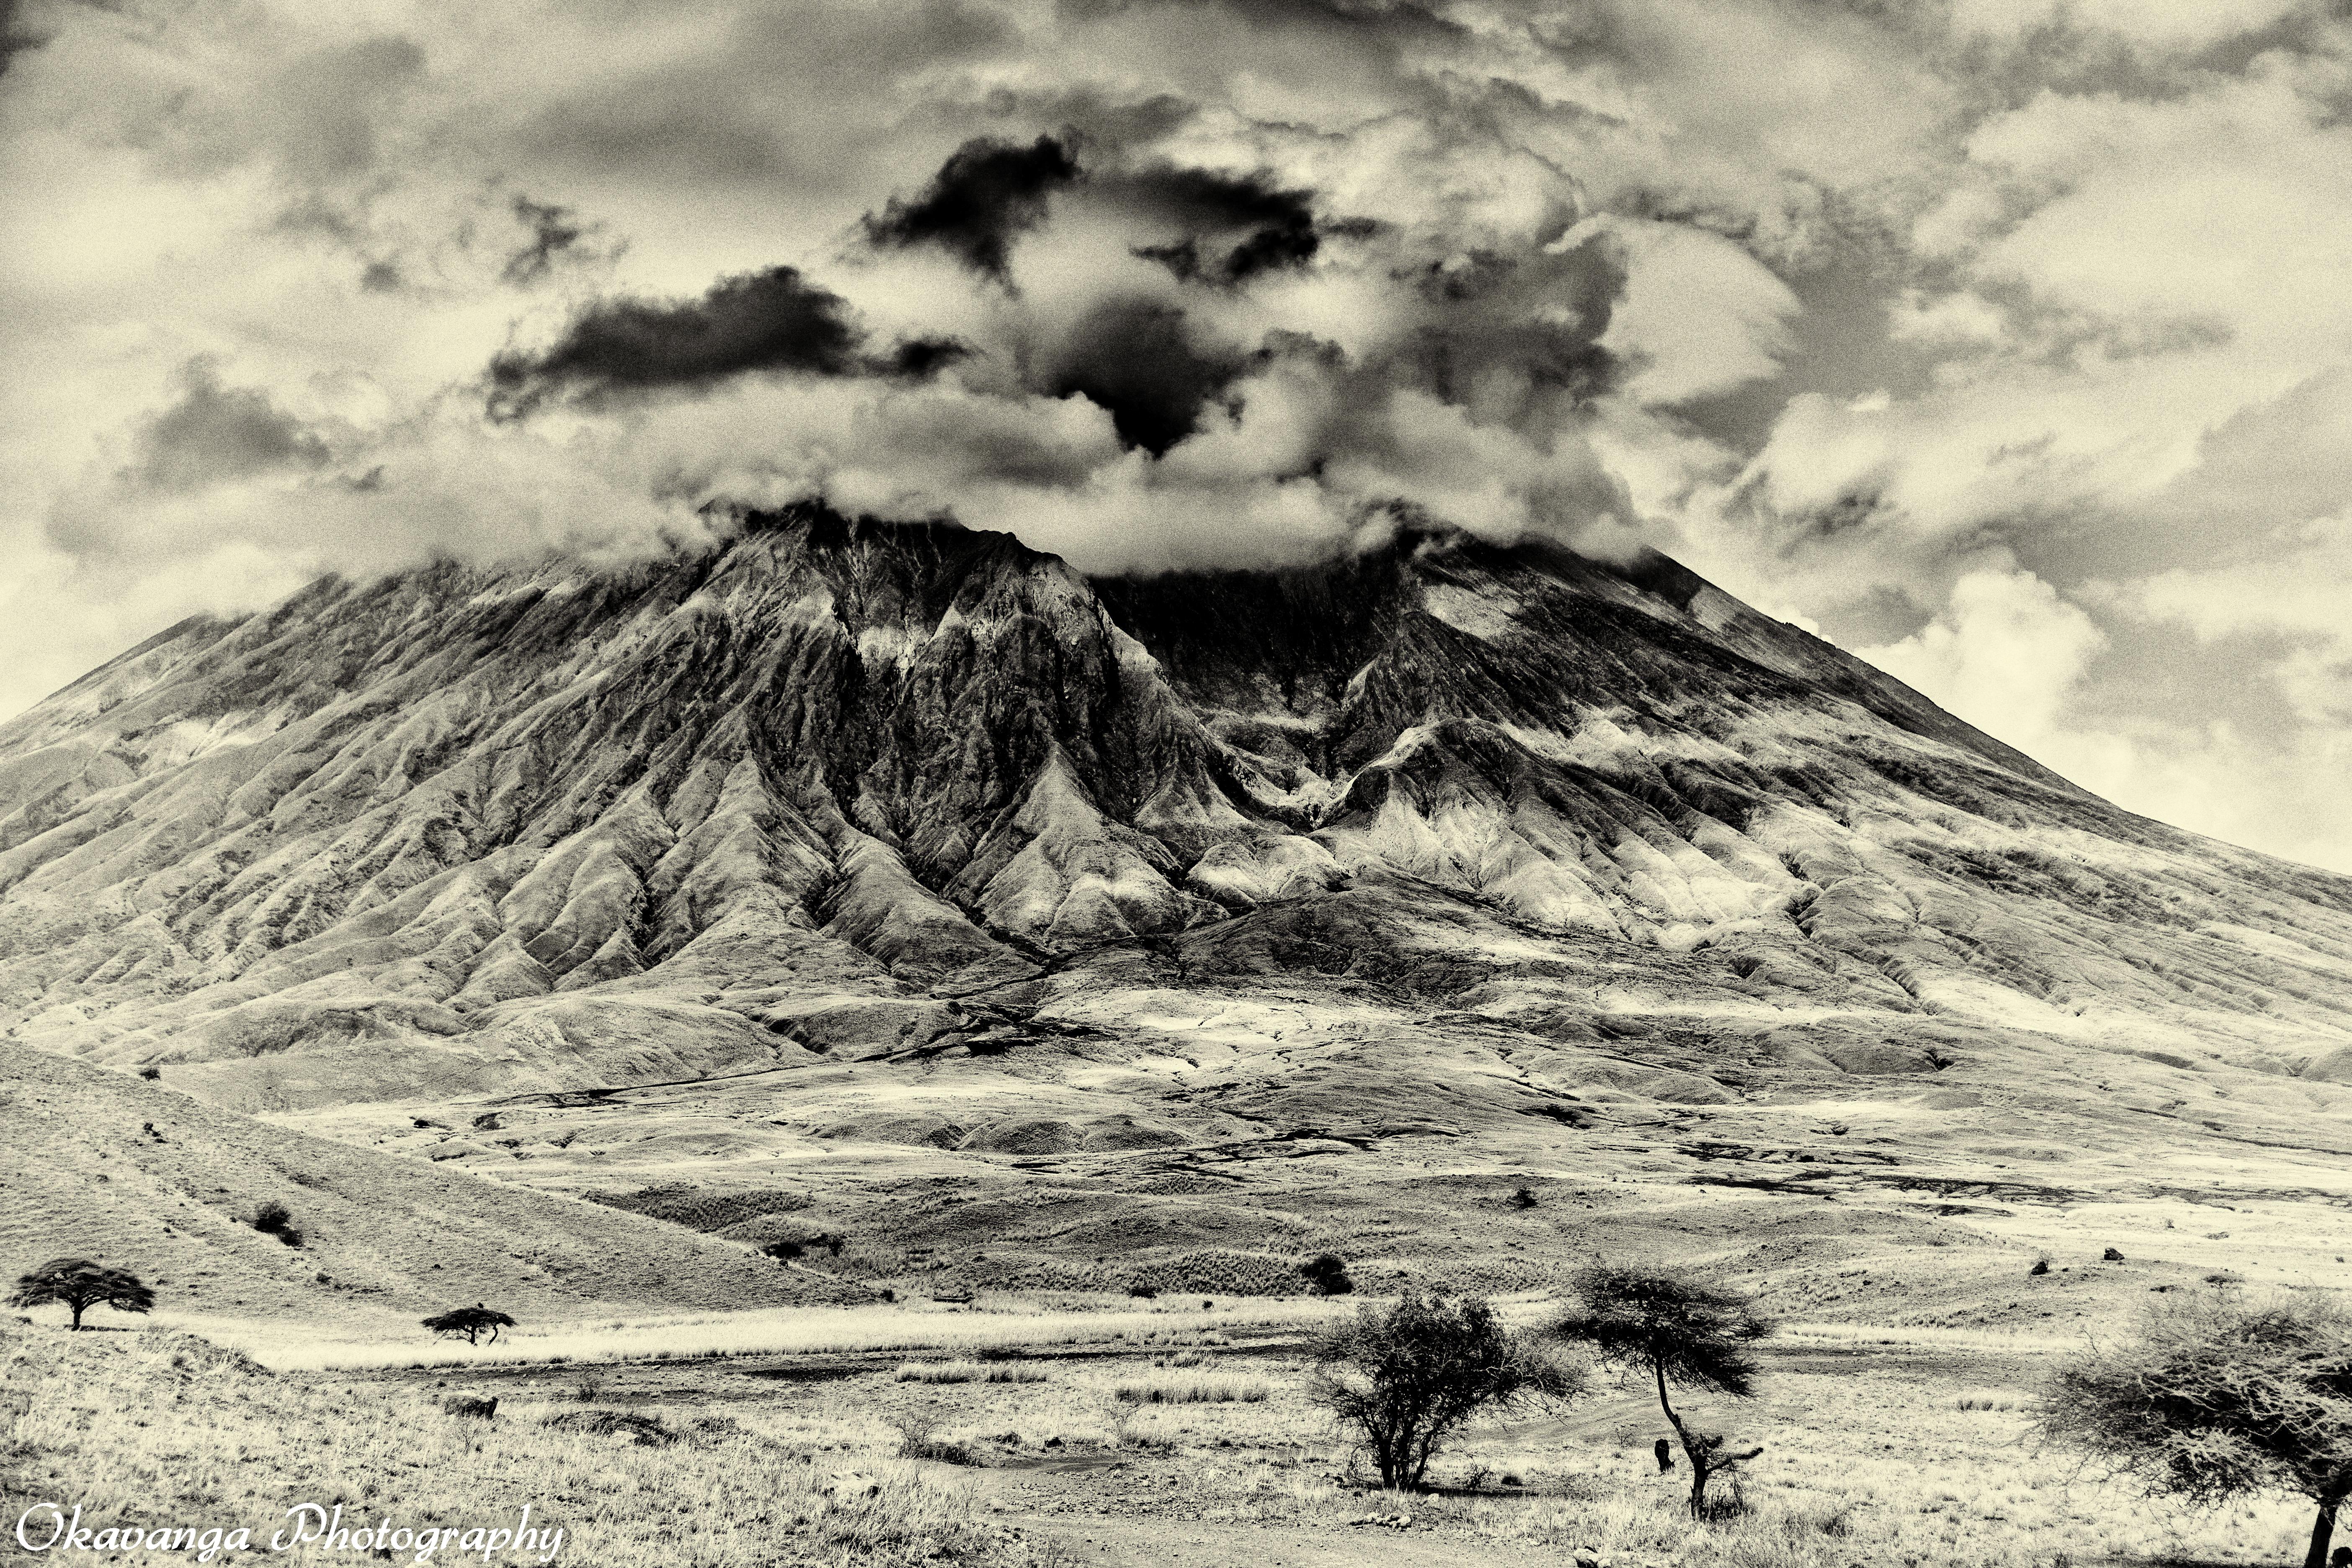 Ol Doinyo Lengai 1 by Okavanga